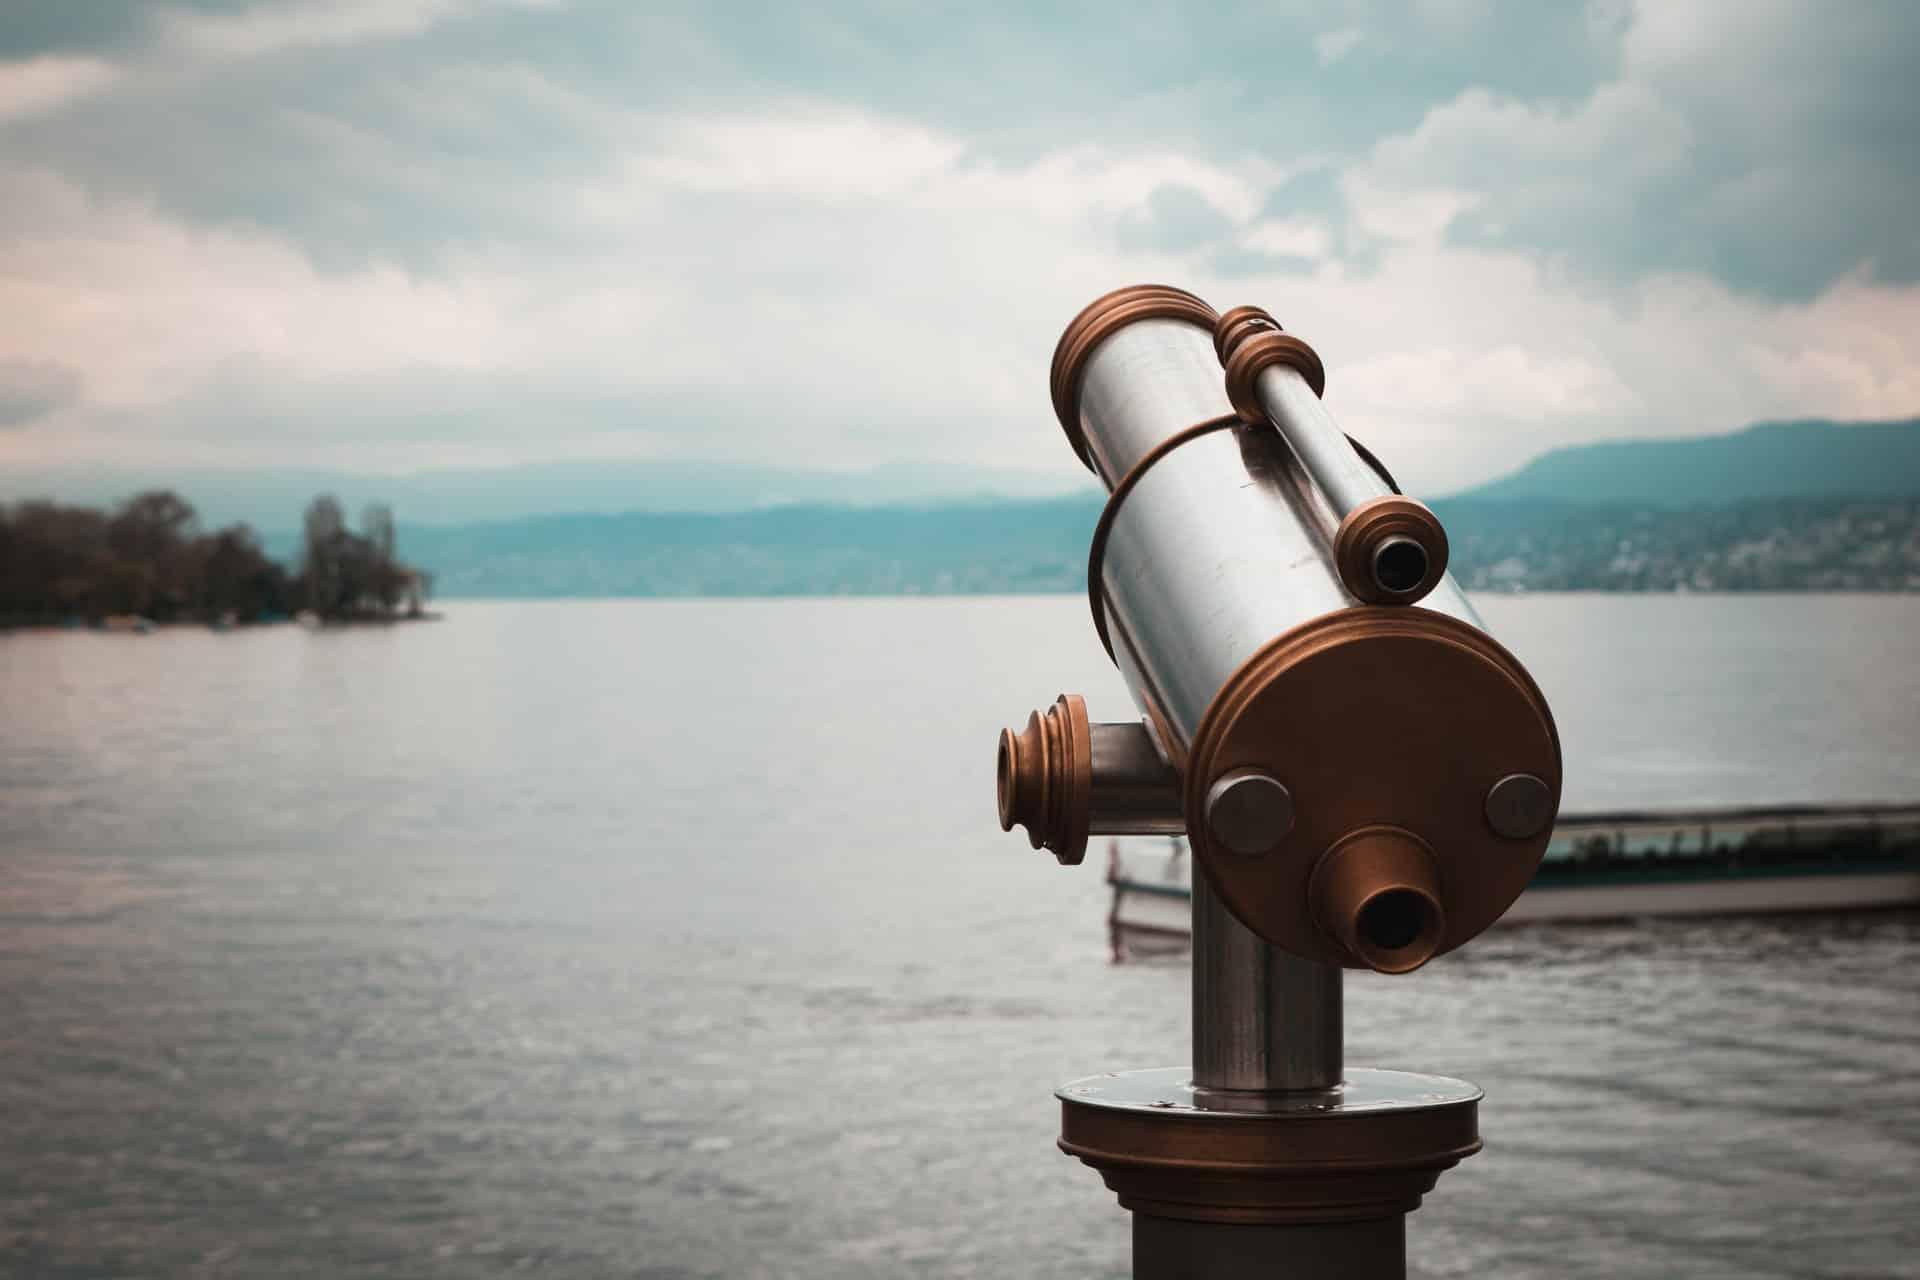 telescope searching